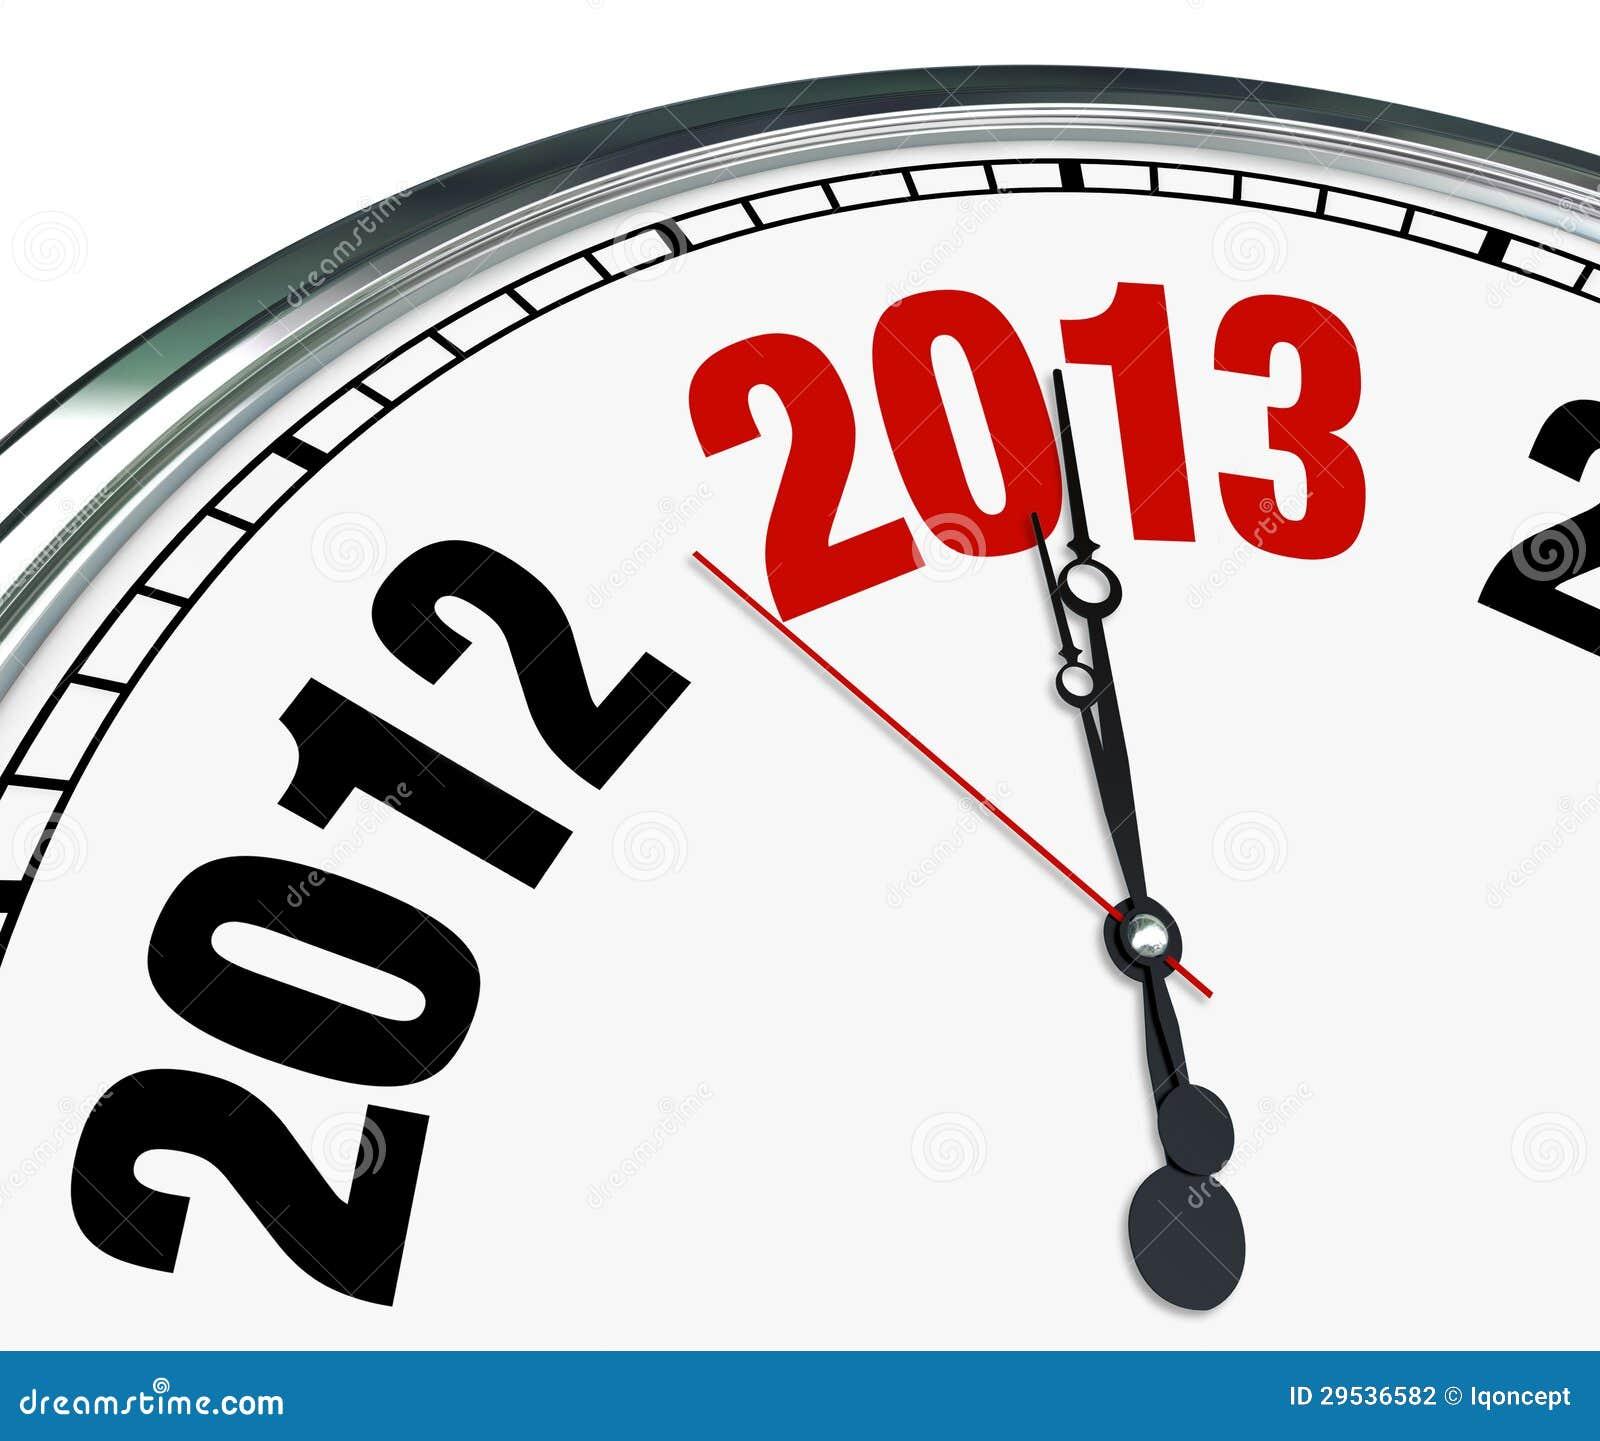 Tempo da face do relógio 2013 que tiquetaqueia para baixo ao começo do ano novo